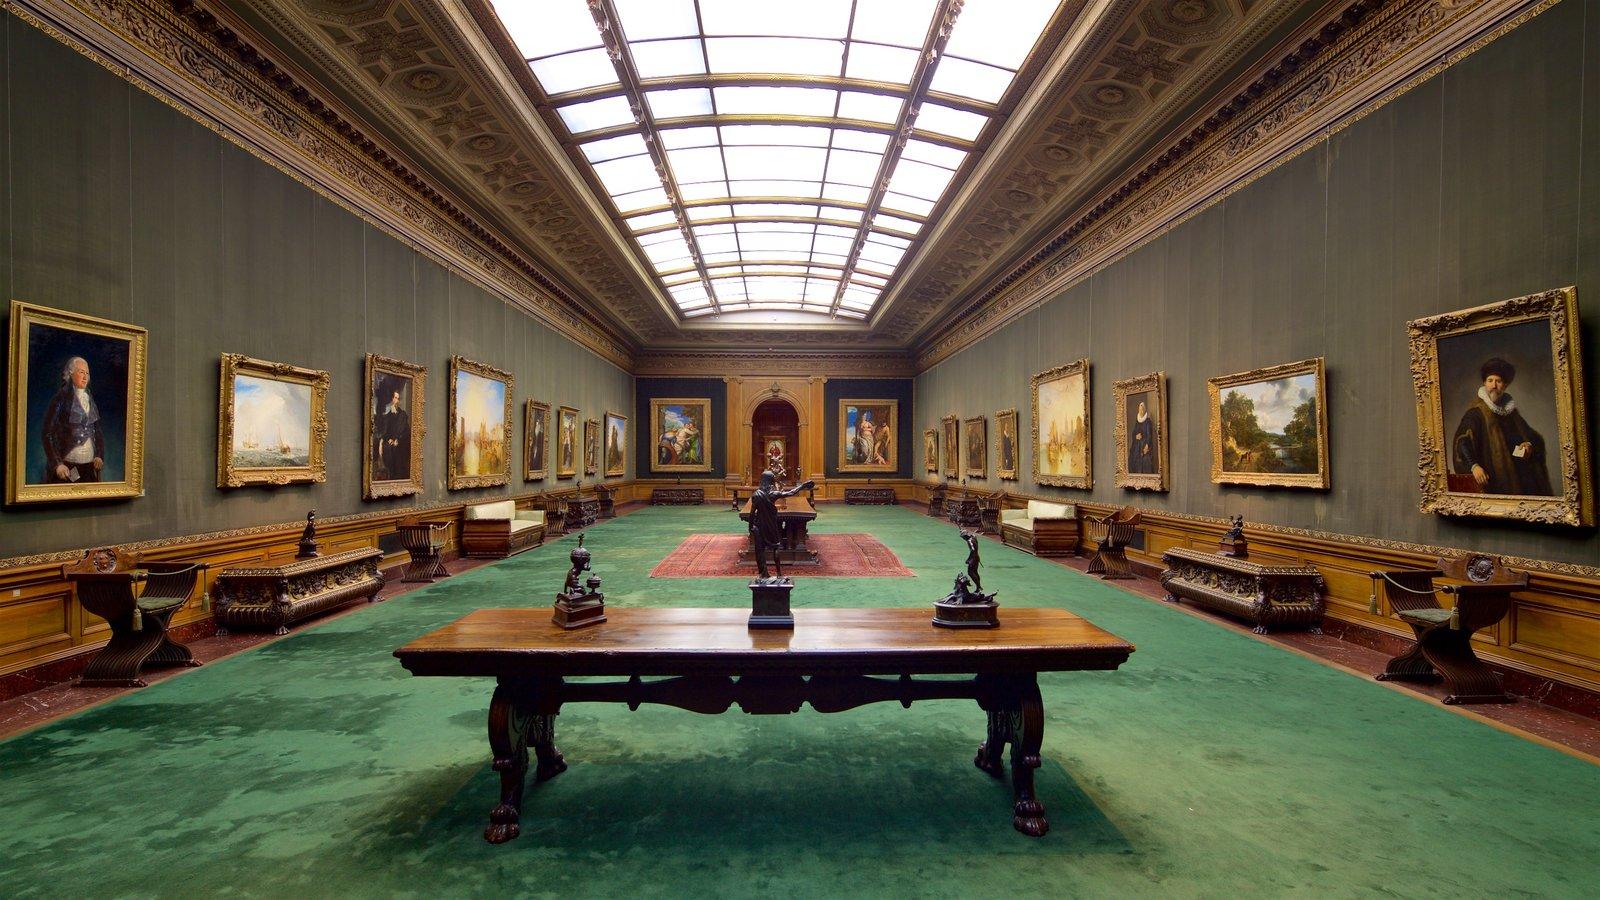 The Frick Collection - New York - worldwidemuseumguide.com